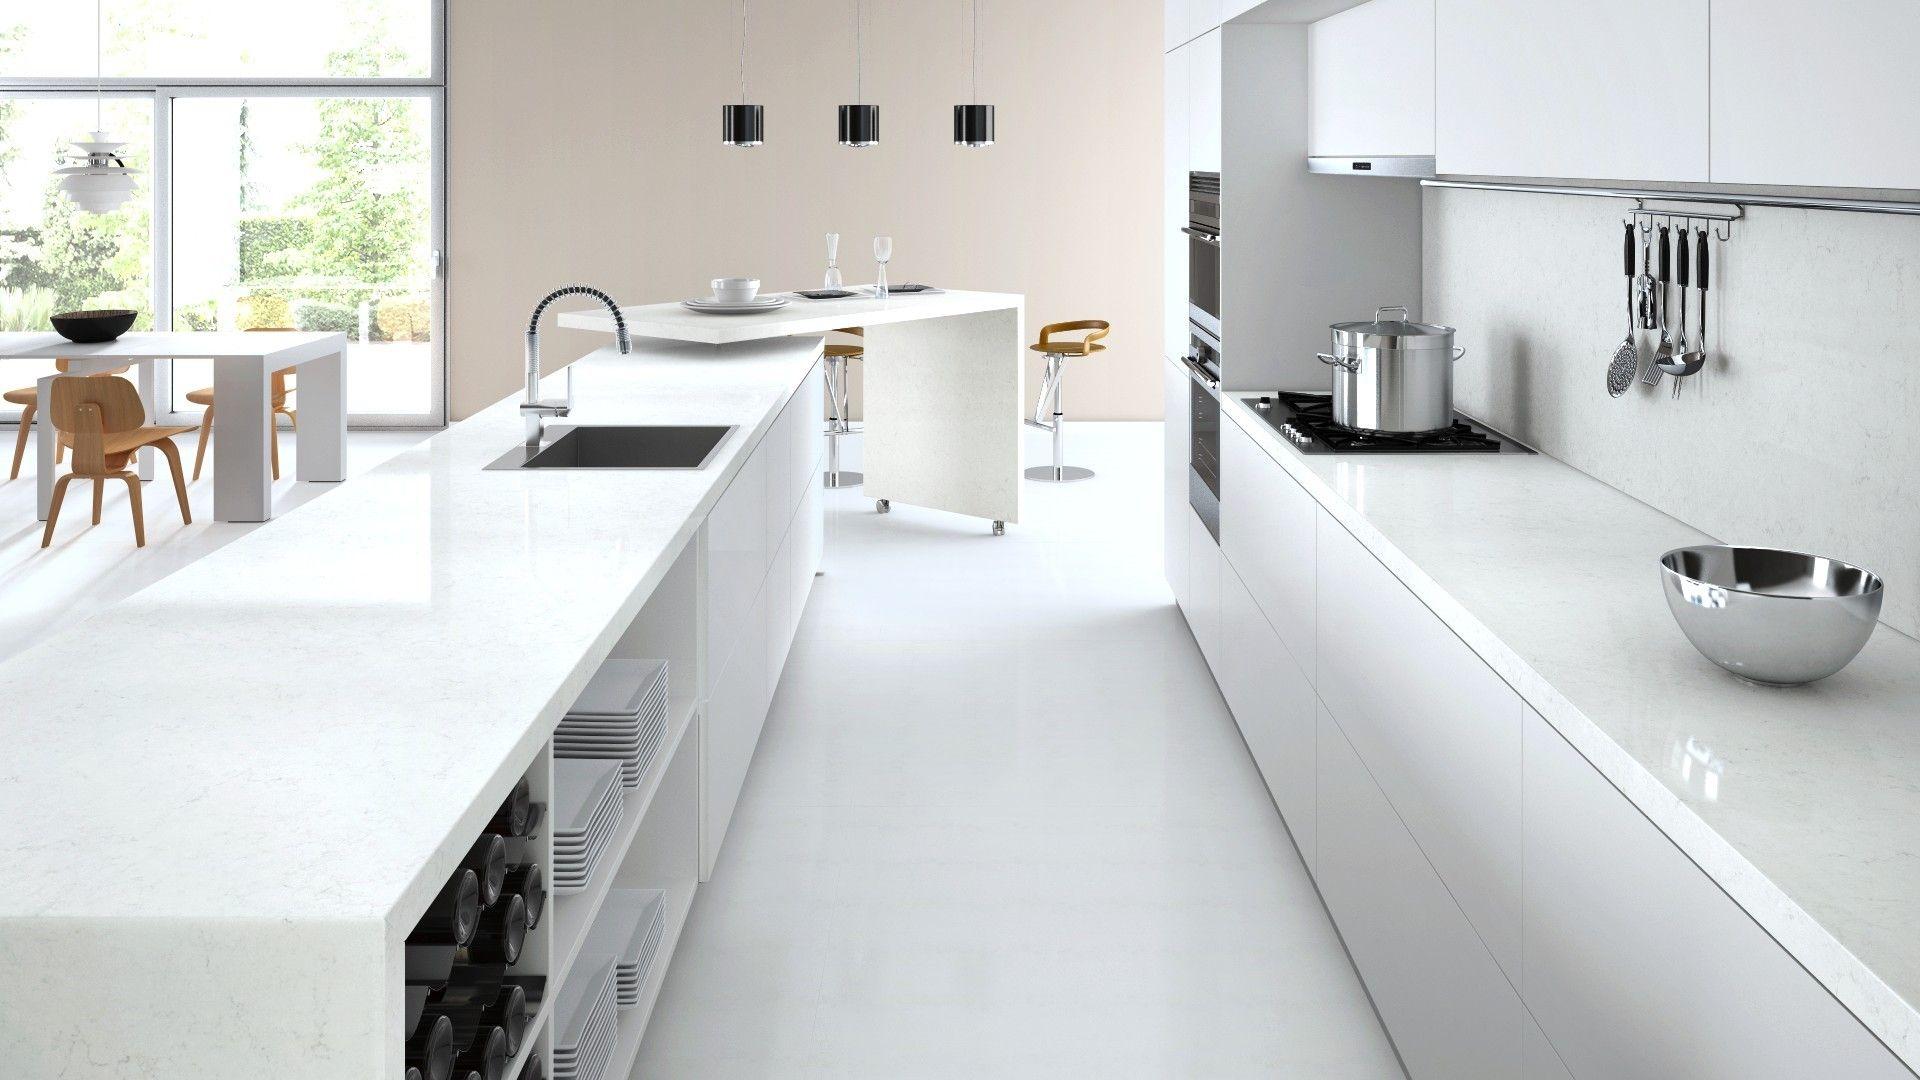 Caesarstone designer kitchens - Kitchen Surface Caesarstone Frosty Carrina